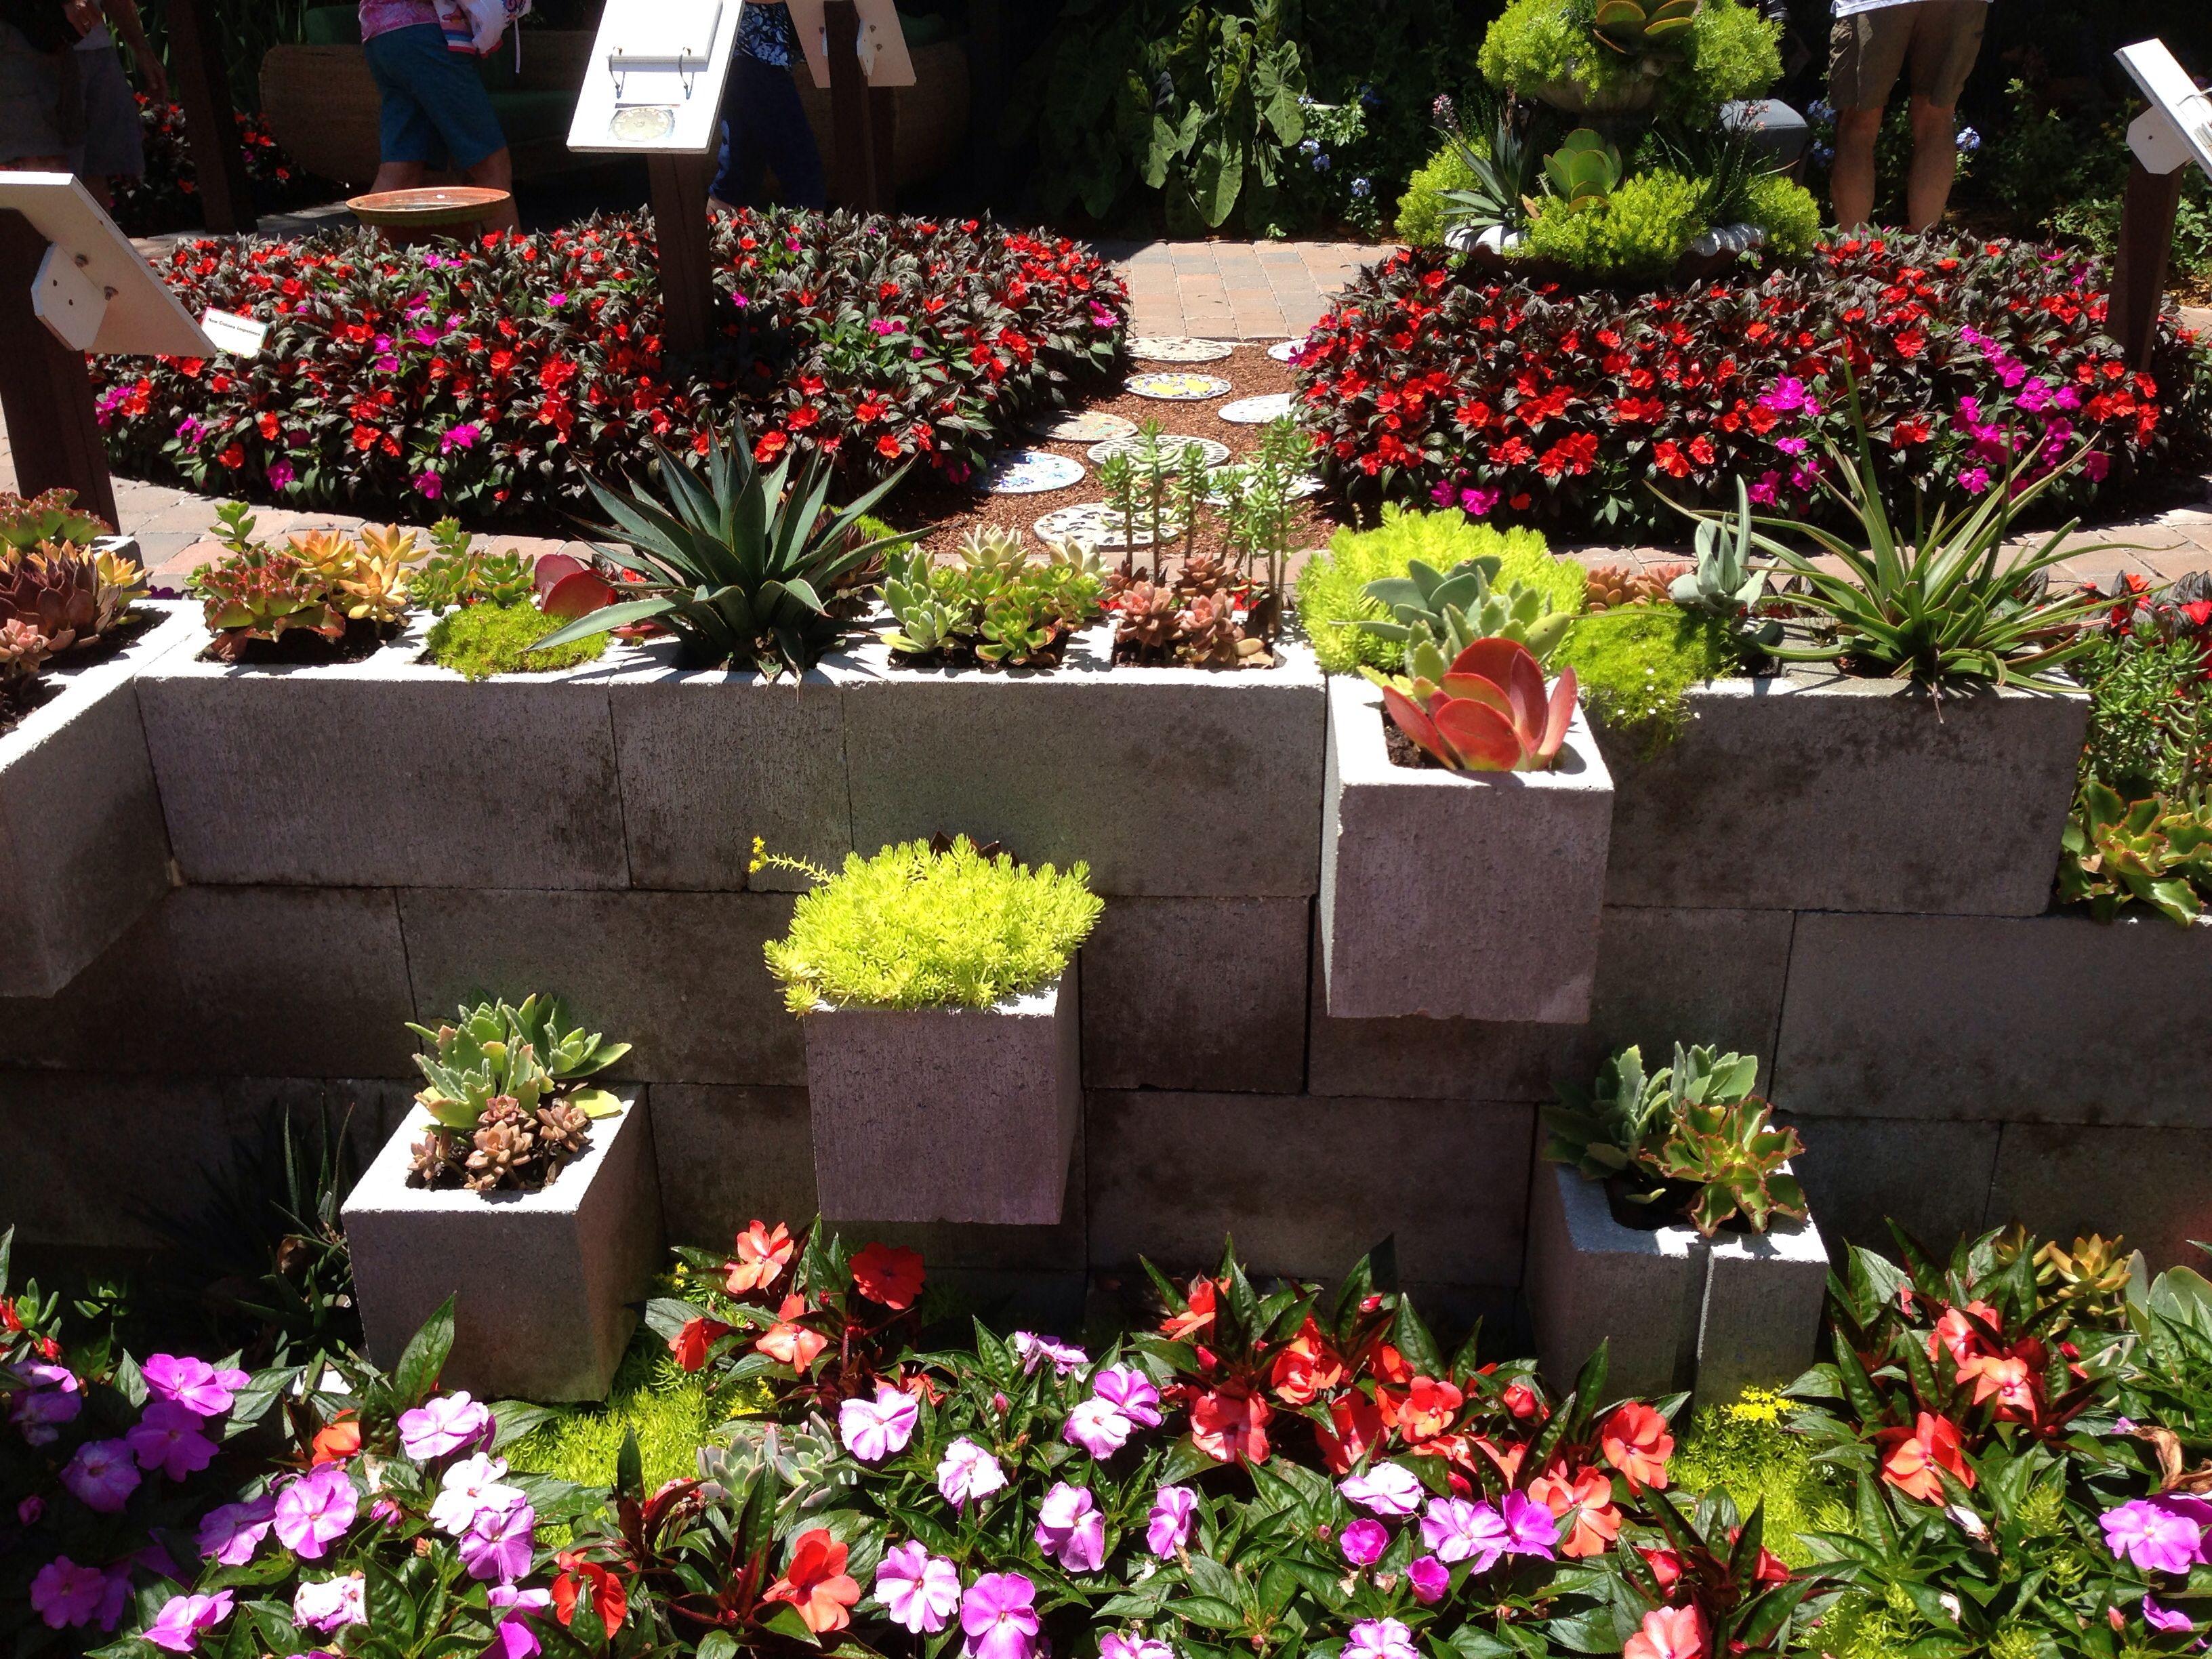 Cinder block garden wall idea | Cinder block garden ... on Backyard Cinder Block Wall Ideas id=46499